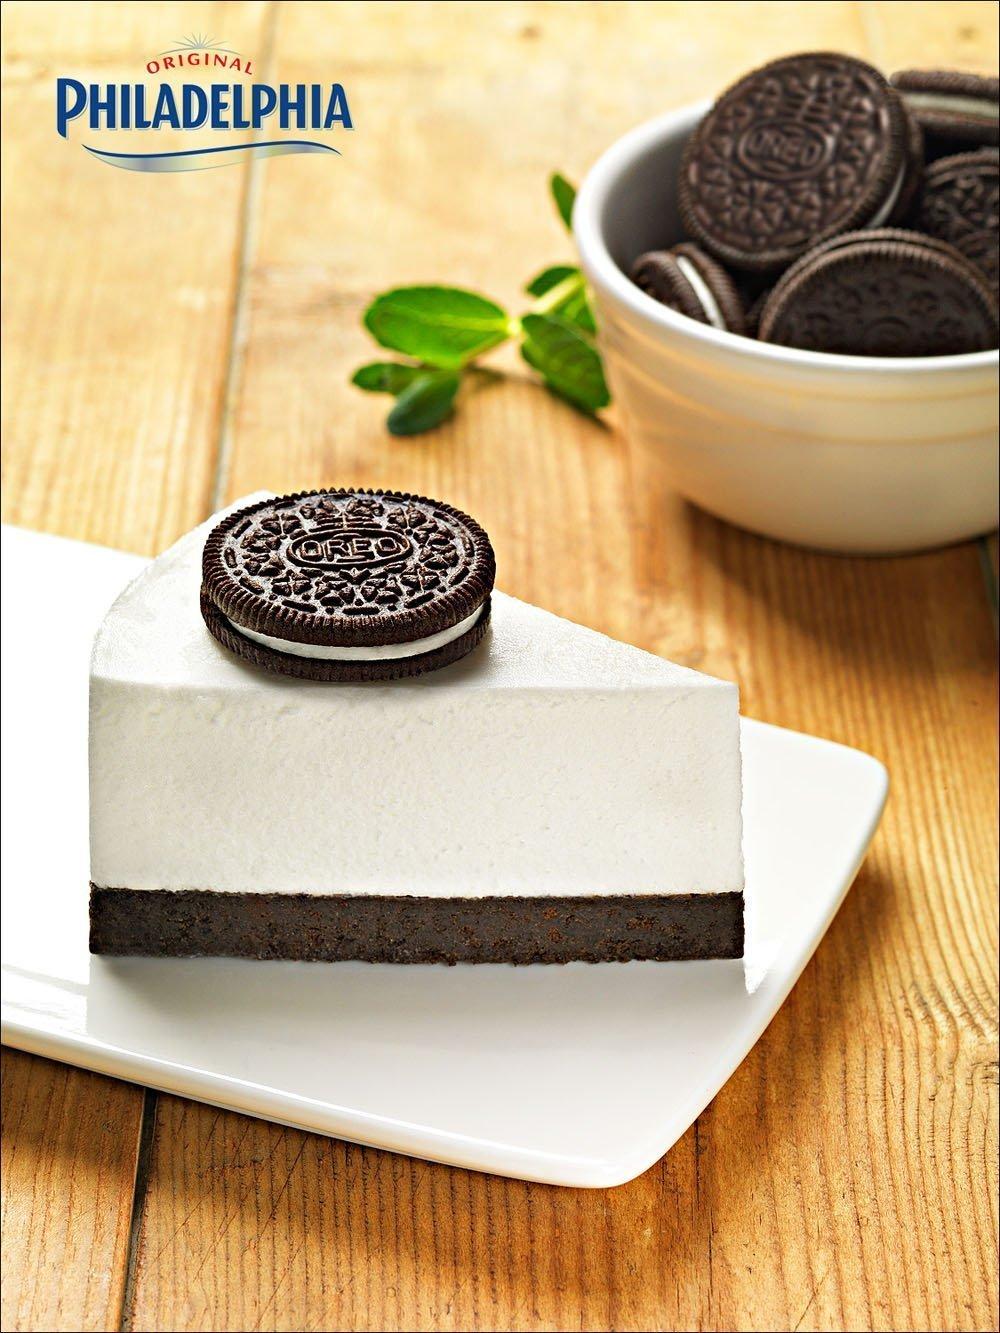 029-fotografo-food-gelato-dolci-cioccolato